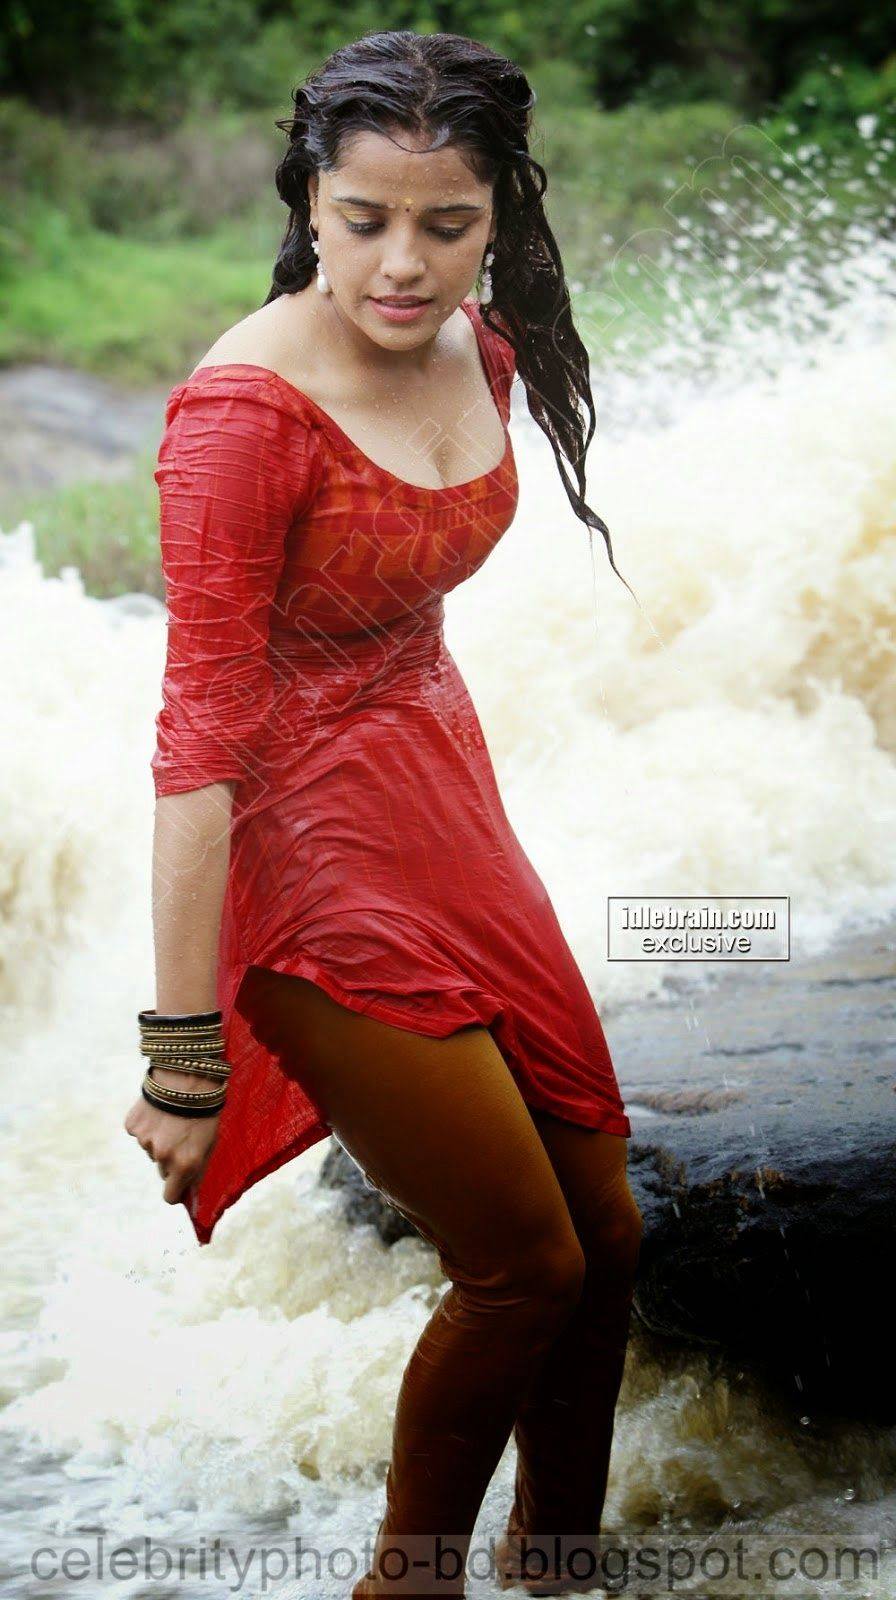 Wet hot girlsexy legs skirts@todorazor.com